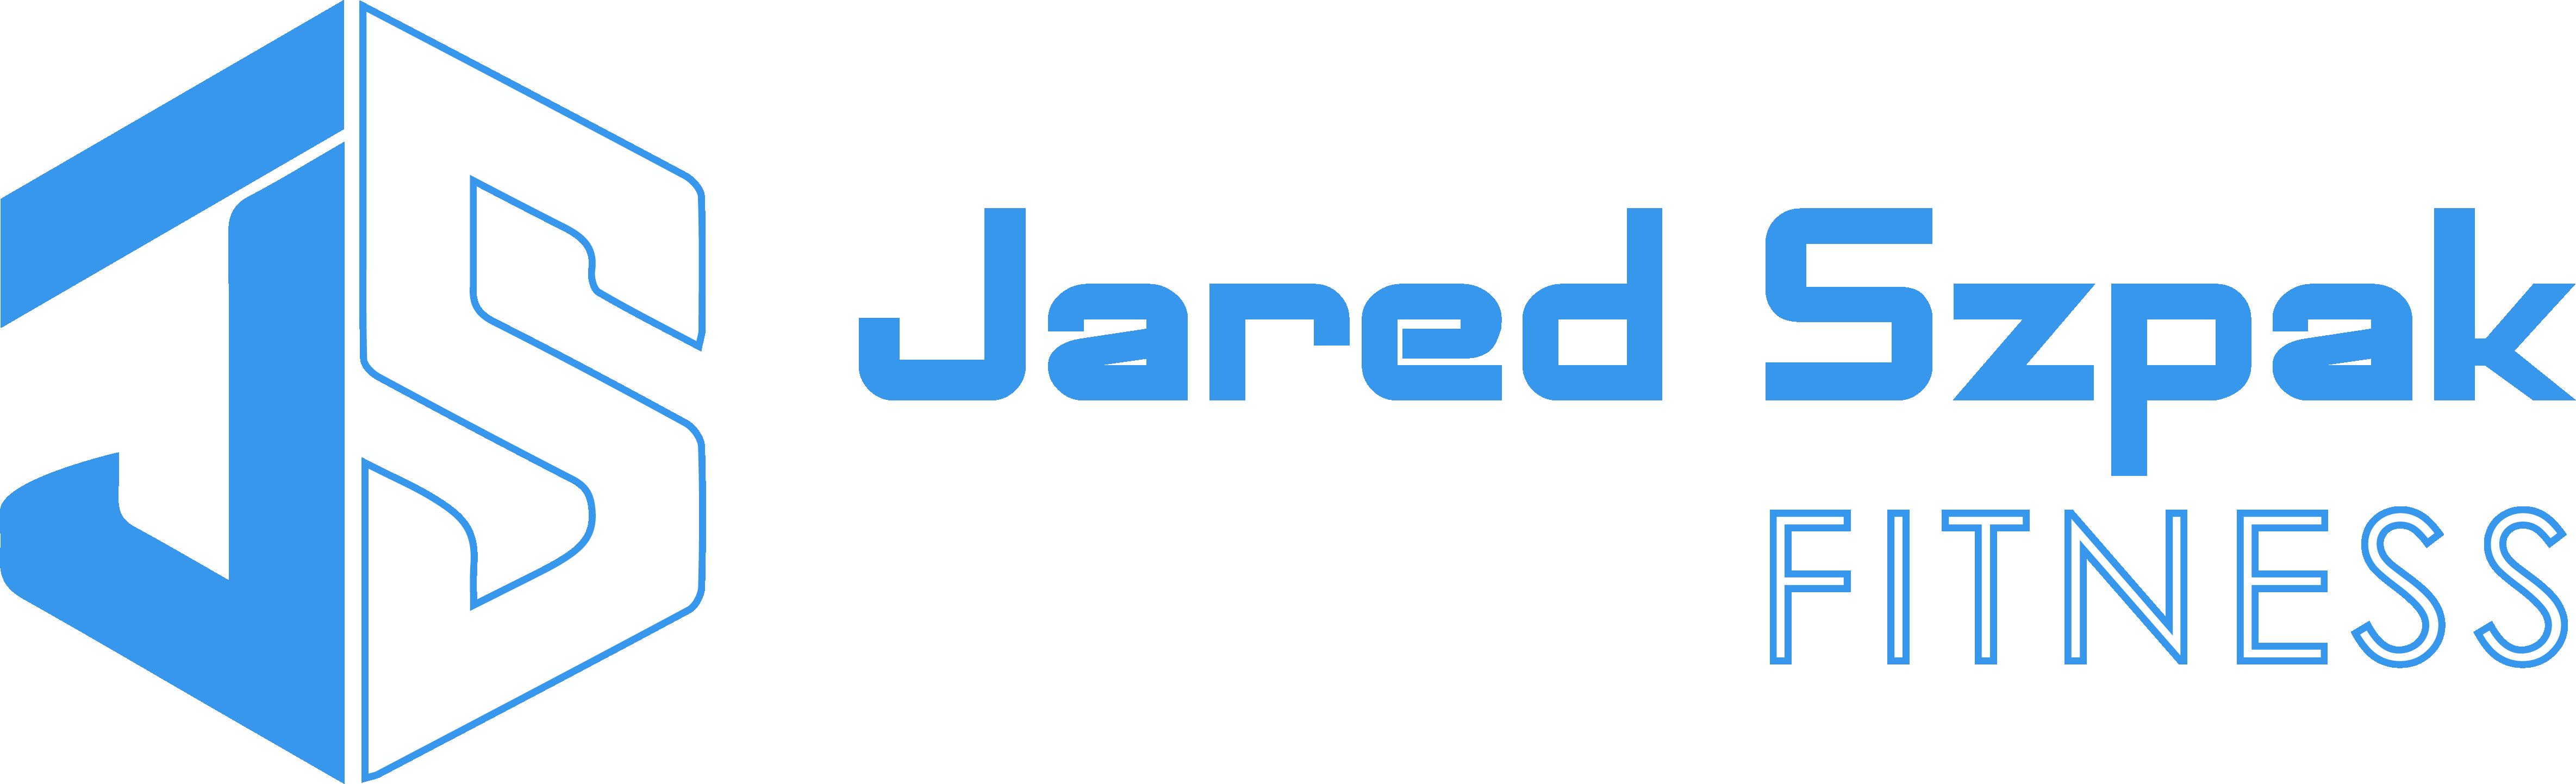 Jared Szpak Fitness